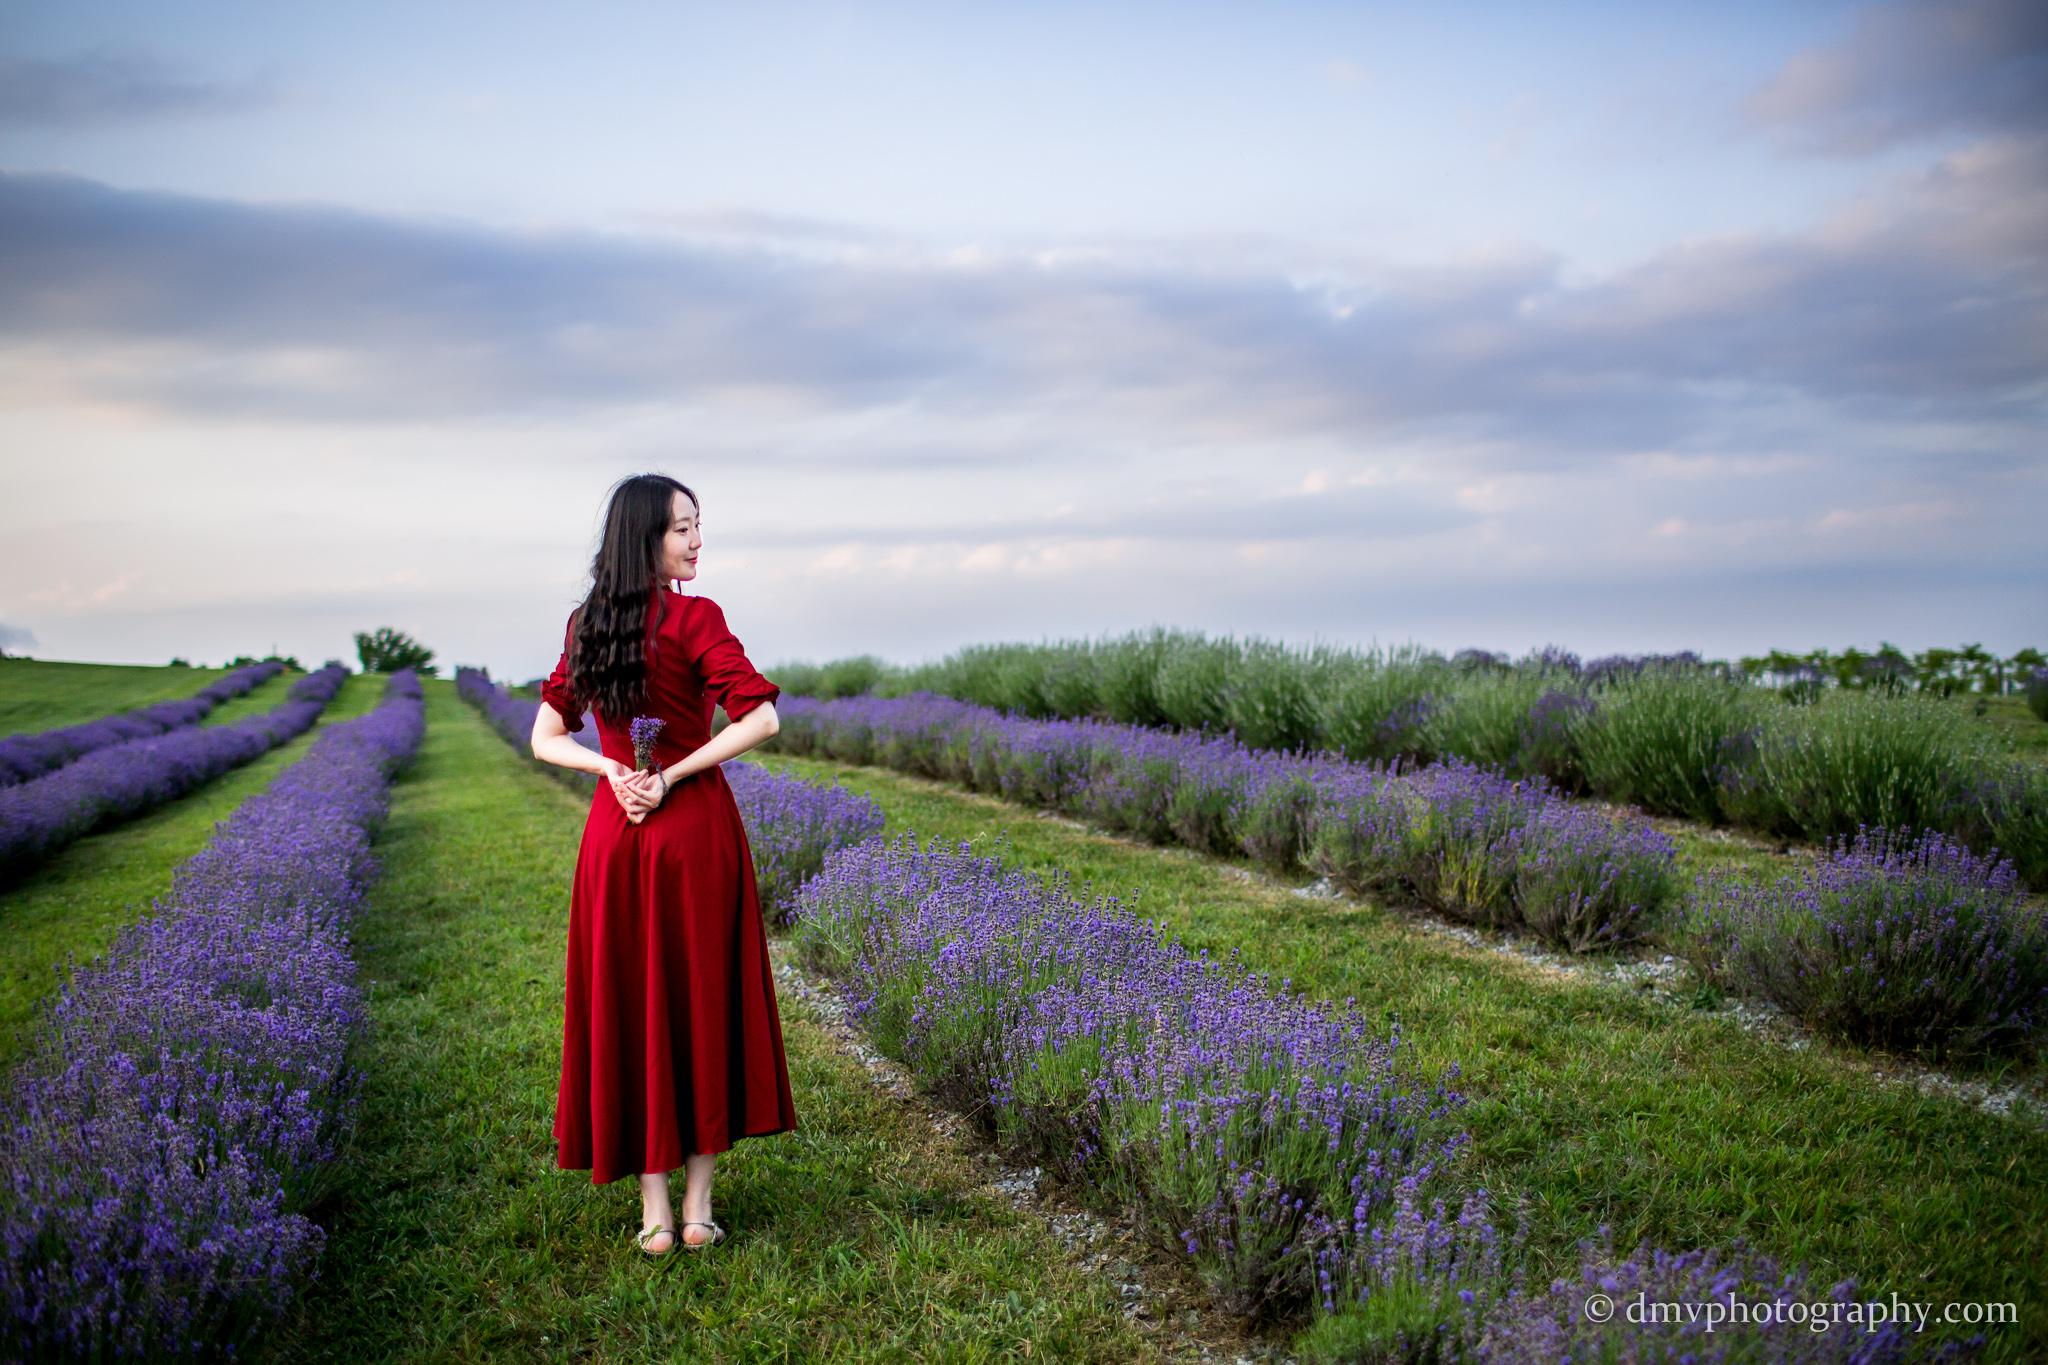 2016-06-24 - Zhu Xing - Lavender Field - 00041